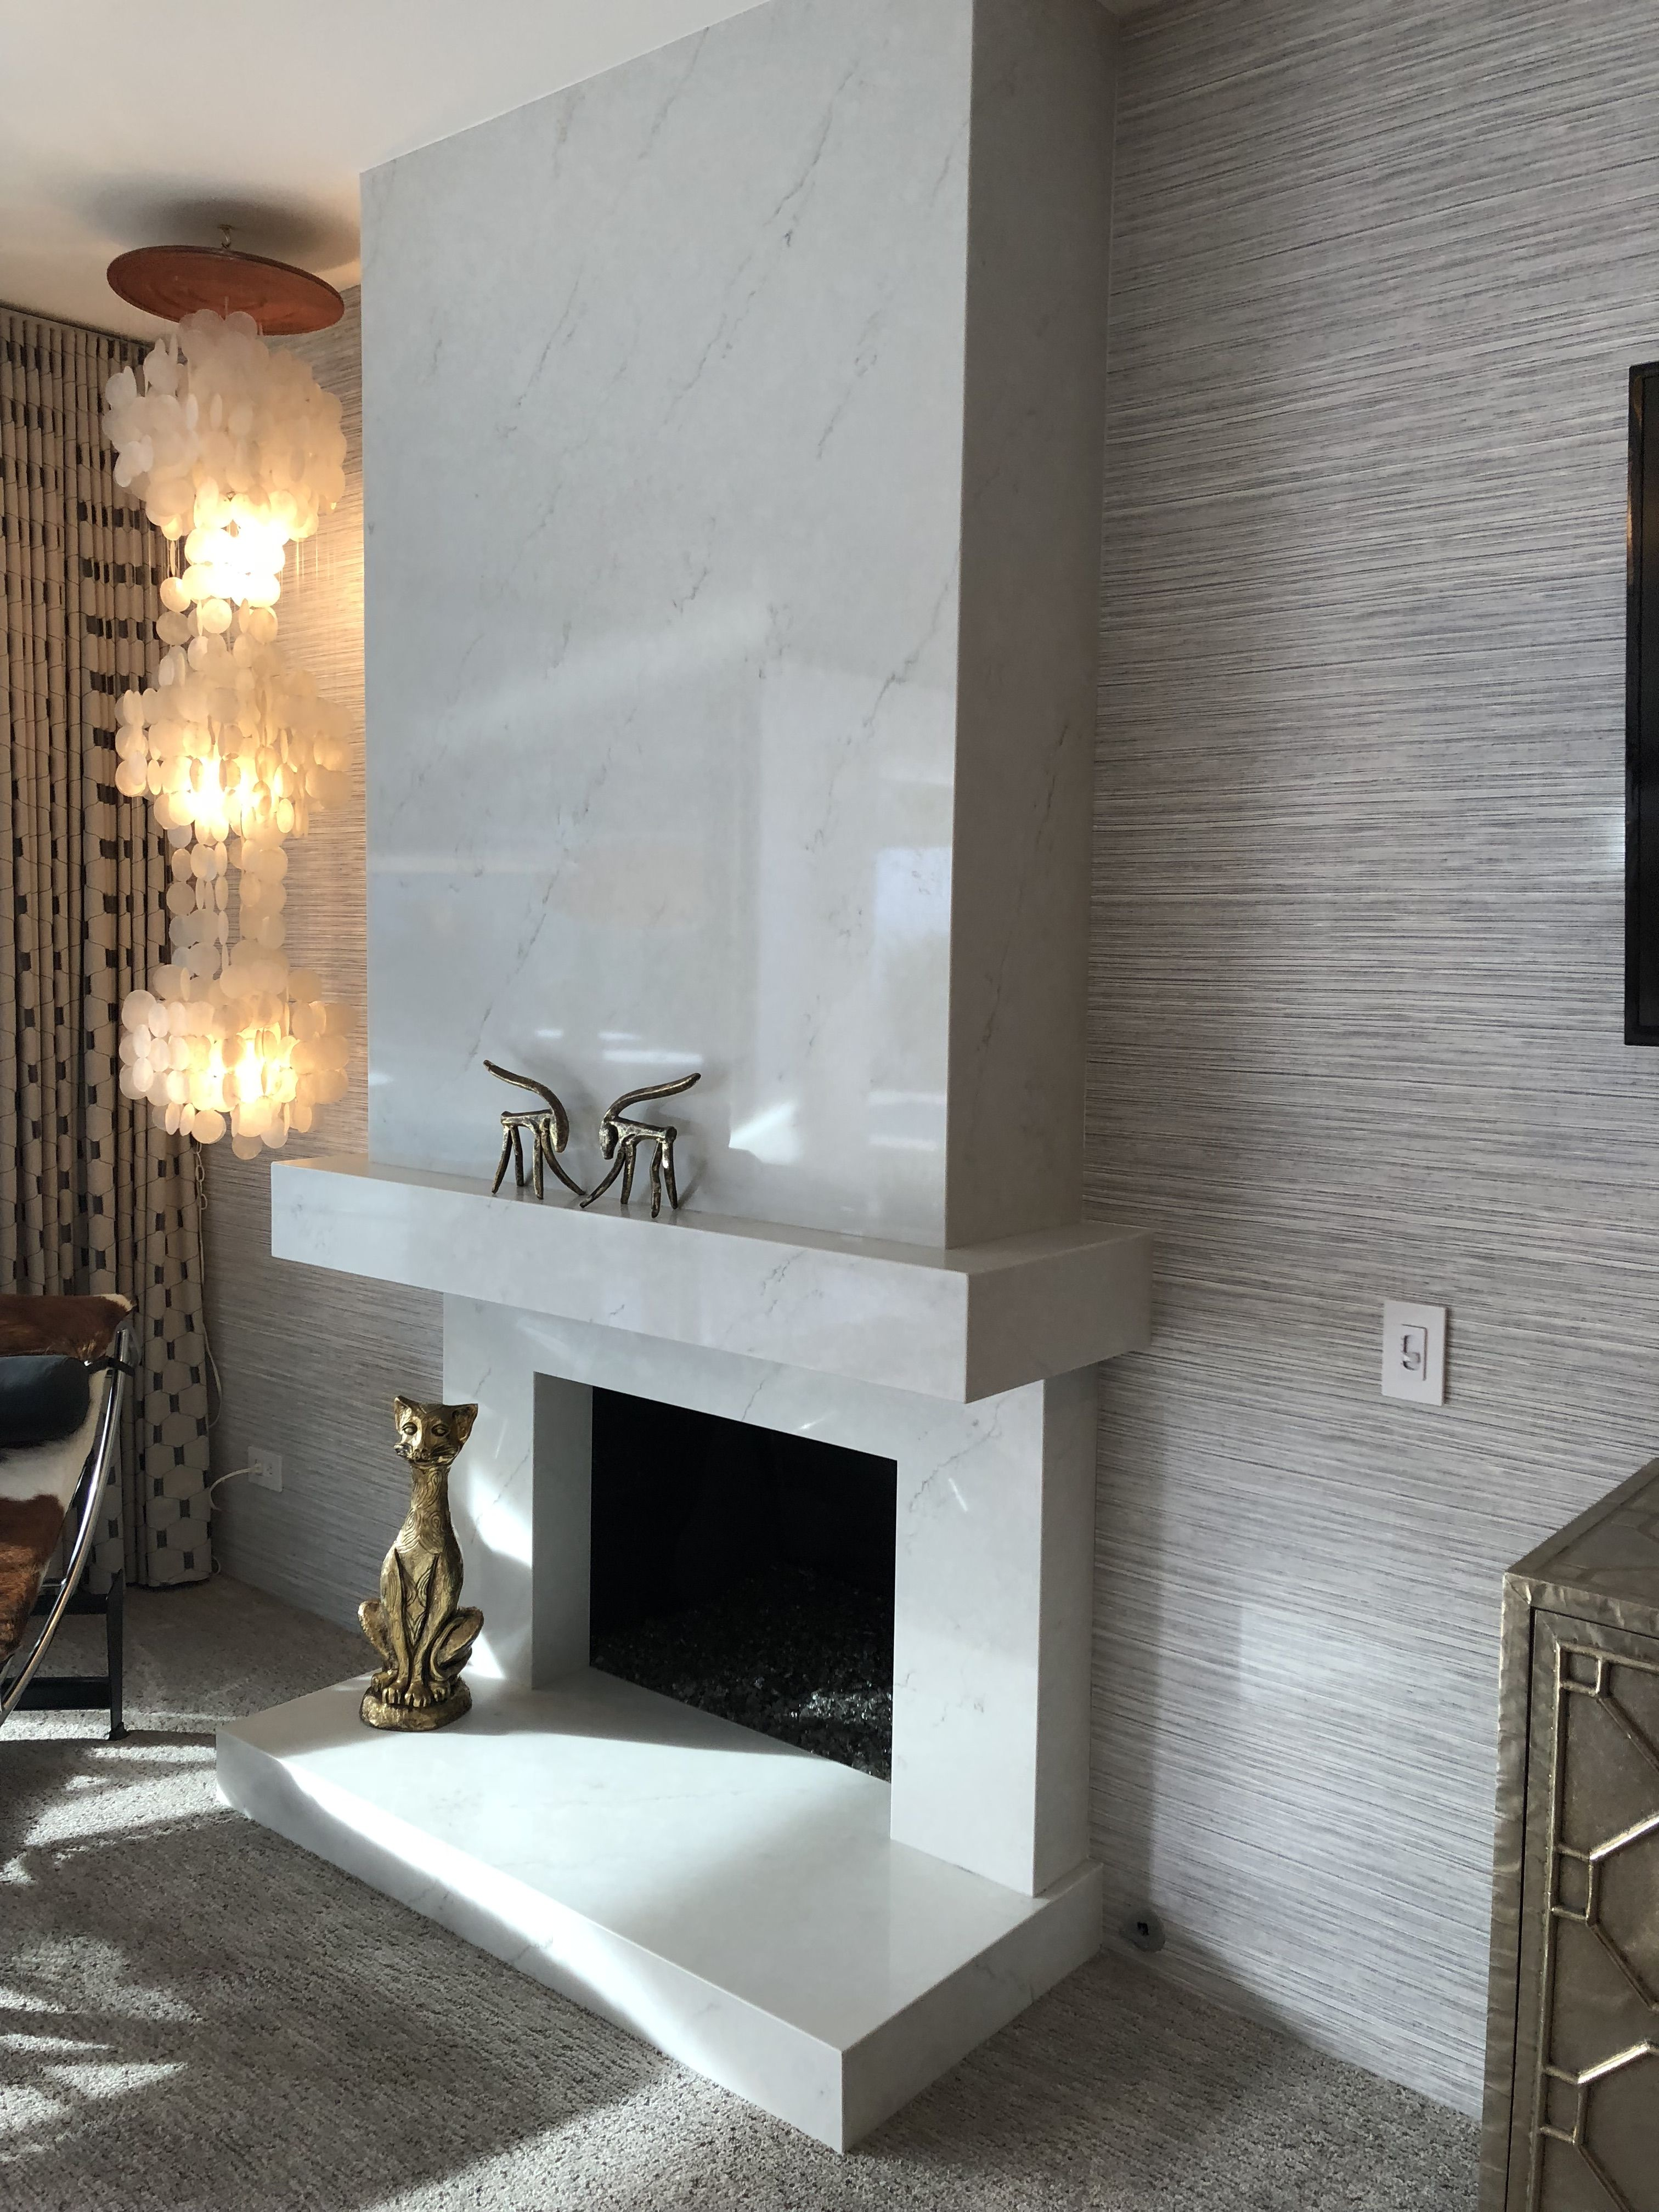 Corian Quartz London Sky Corian Master Bedroom Remodel